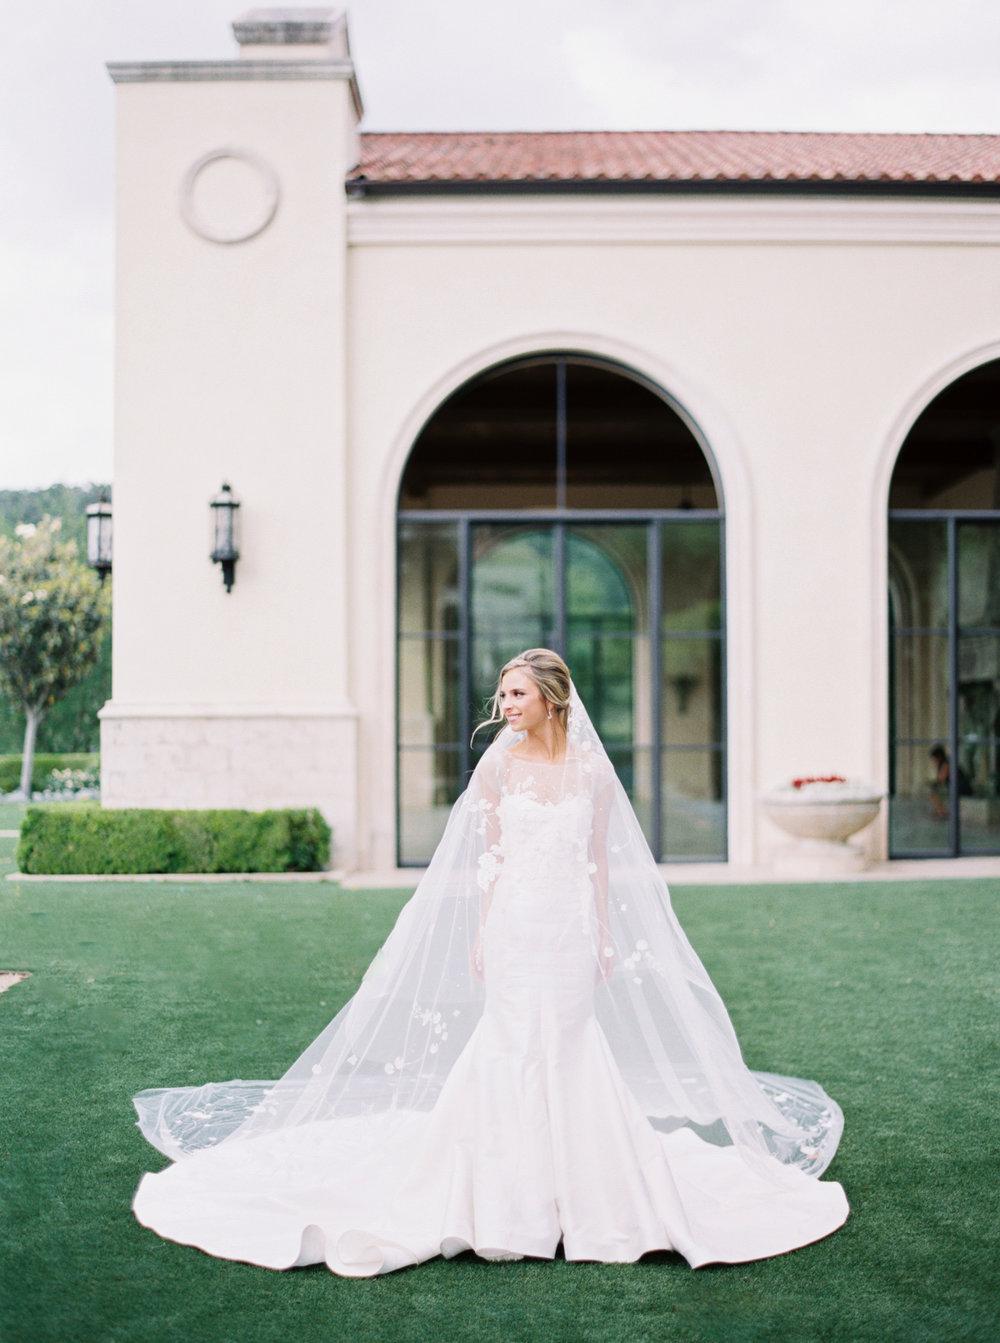 jenna-mcelroy-bridal-portraits-a-southern-tradition-15